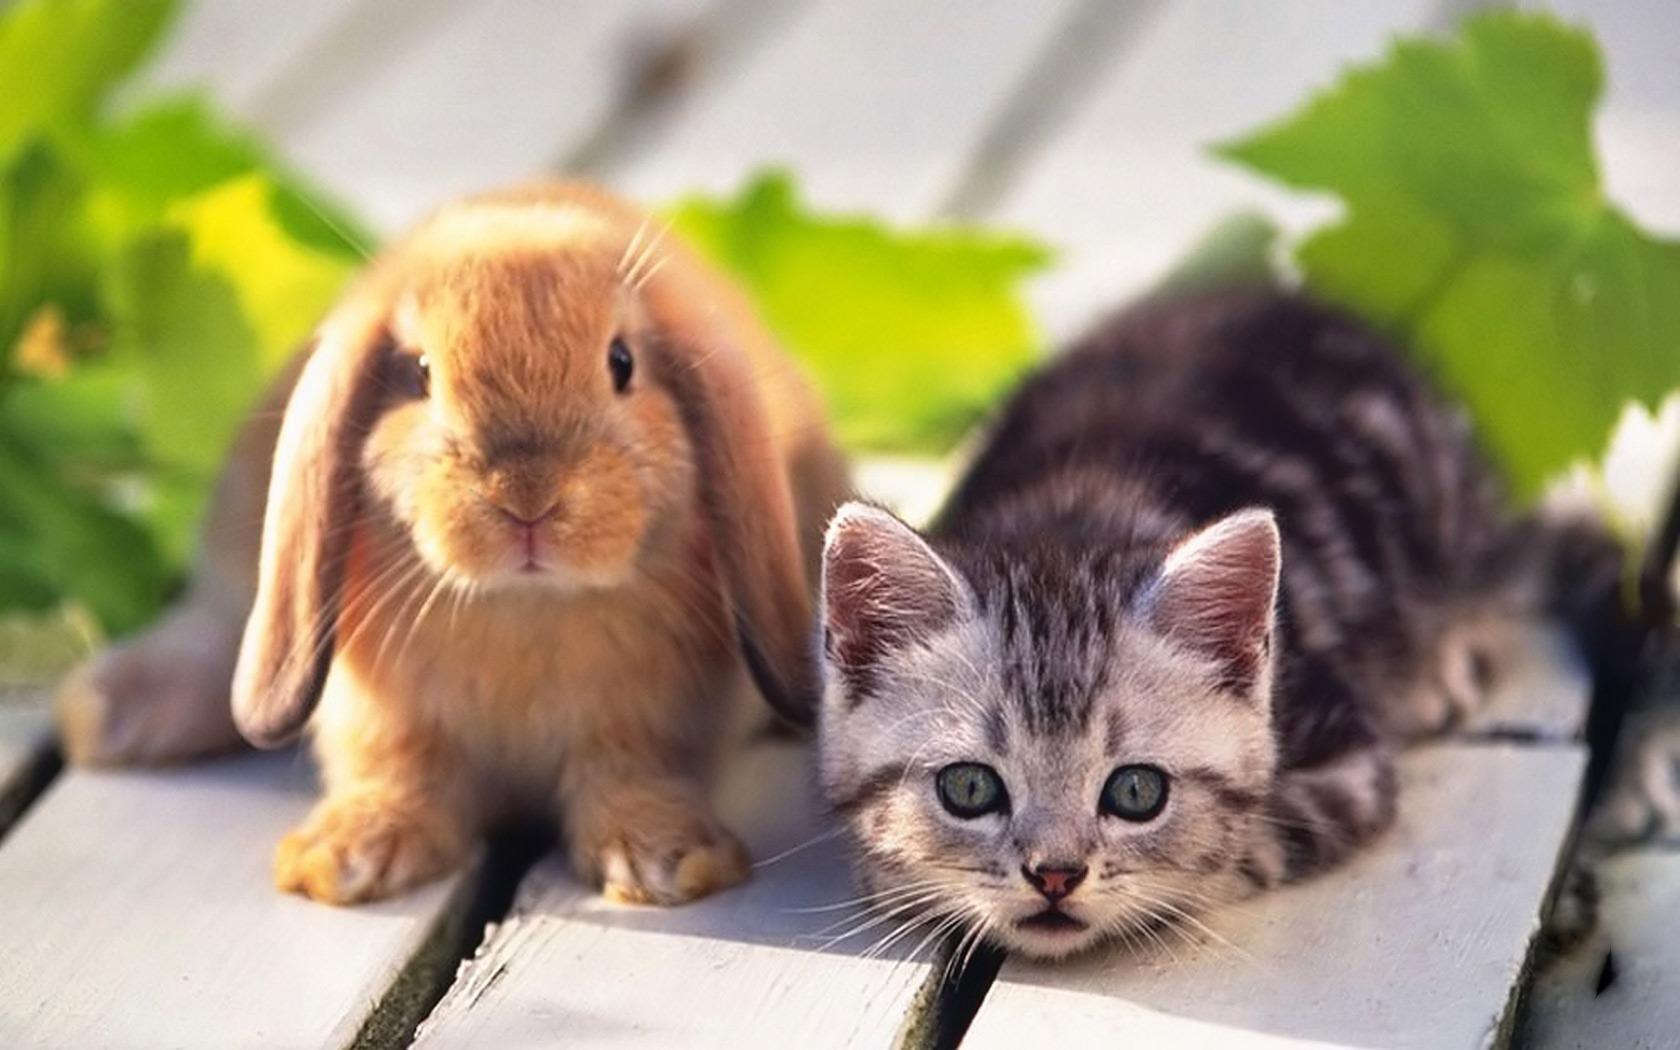 Teddybear64 Images Kitten And Rabbit HD Wallpaper Background Photos